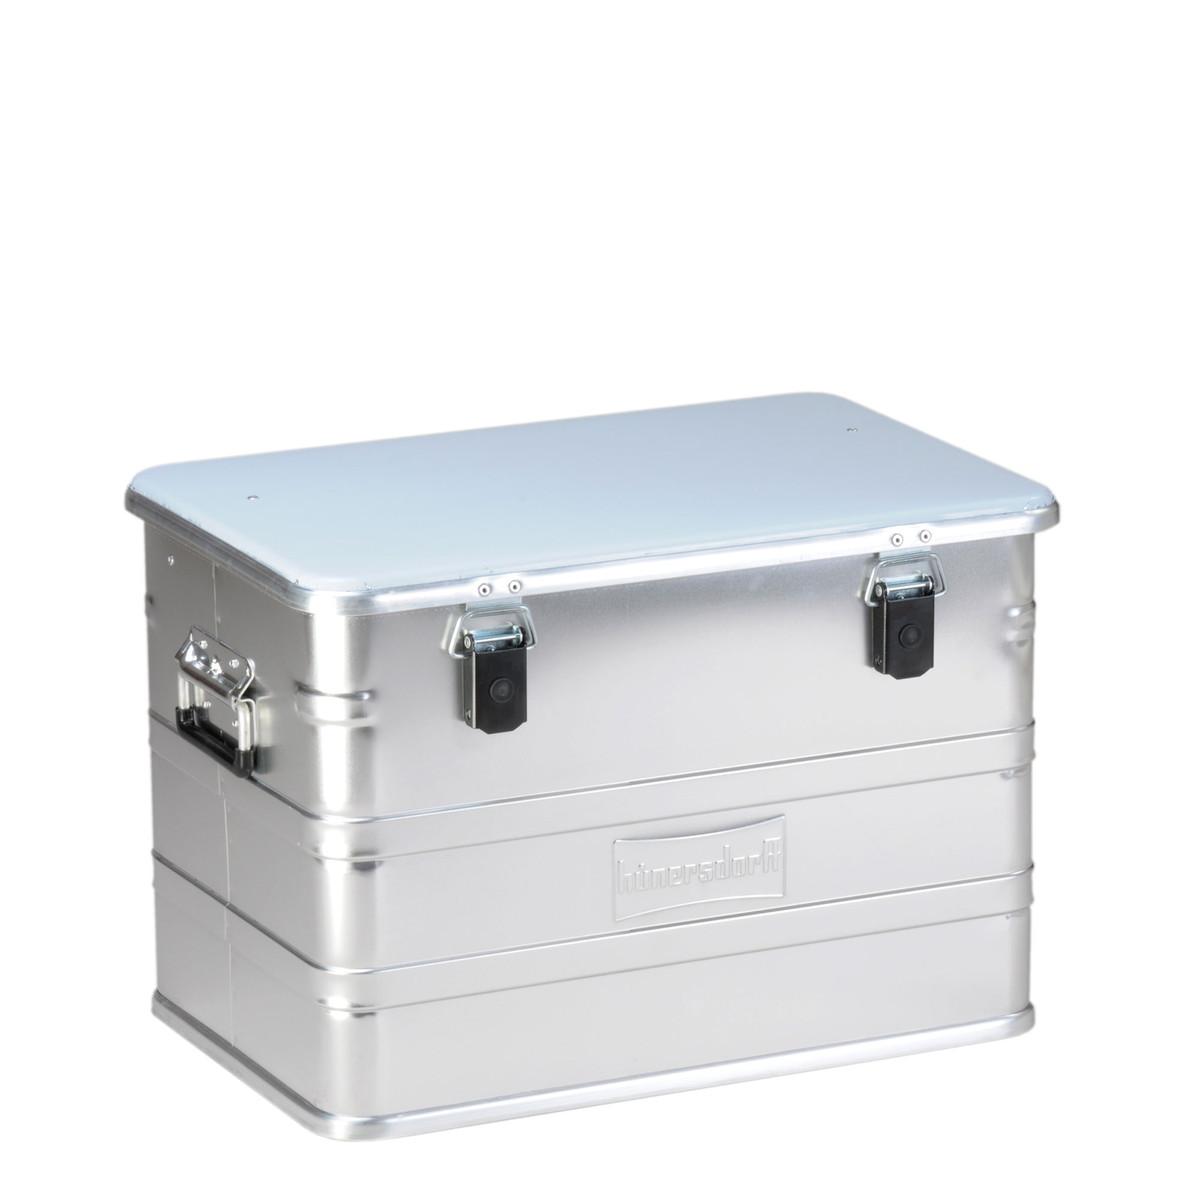 Hunersdorff ヒューナースドルフ ALUMINIUM PROFI BOX 76L アルミコンテナ